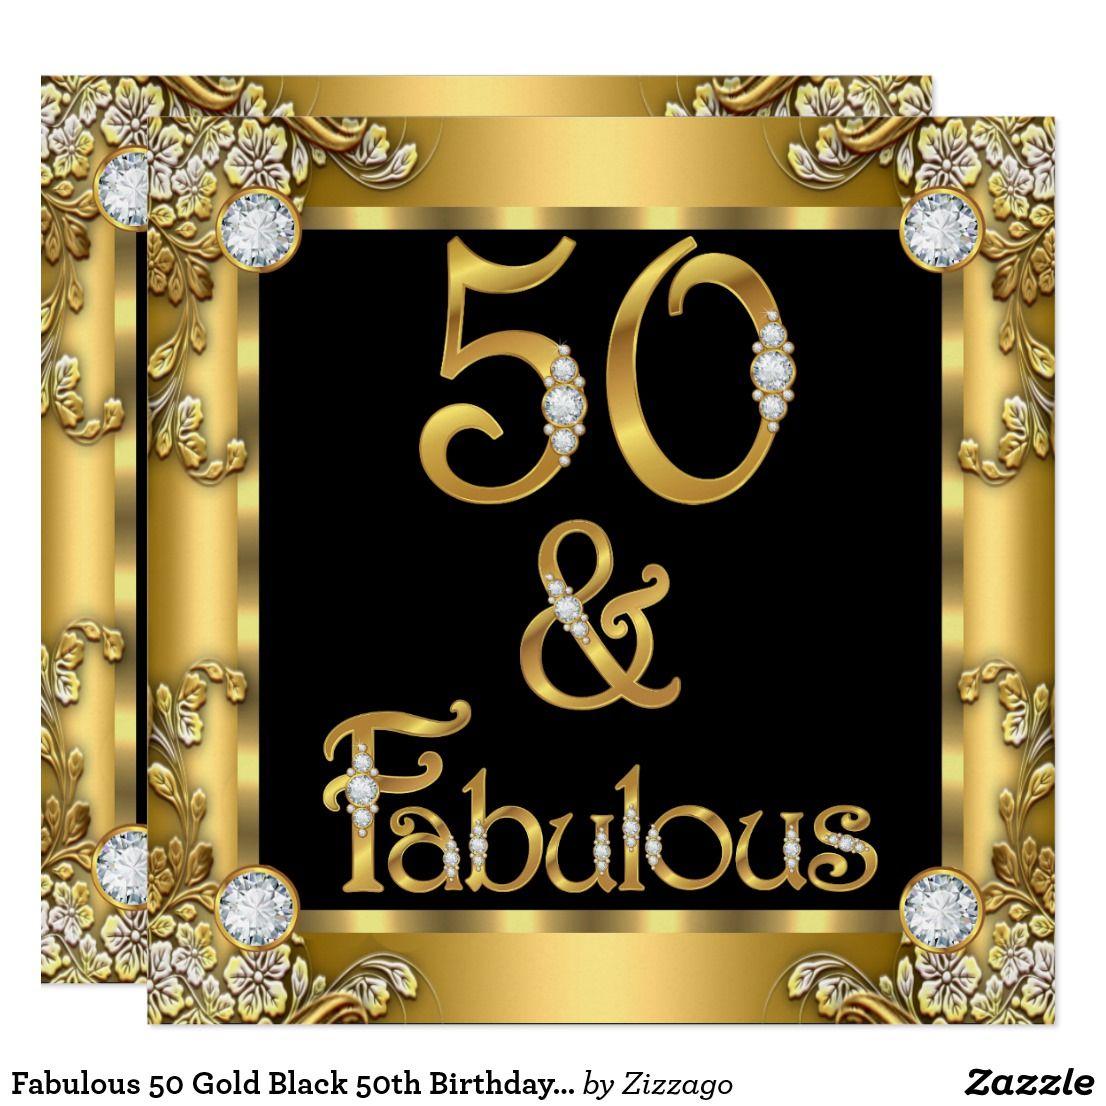 Fabulous 50 Gold Black 50th Birthday Party Invitation   Zazzle.com   50th  birthday party, 50th birthday party invitations, 50th birthday